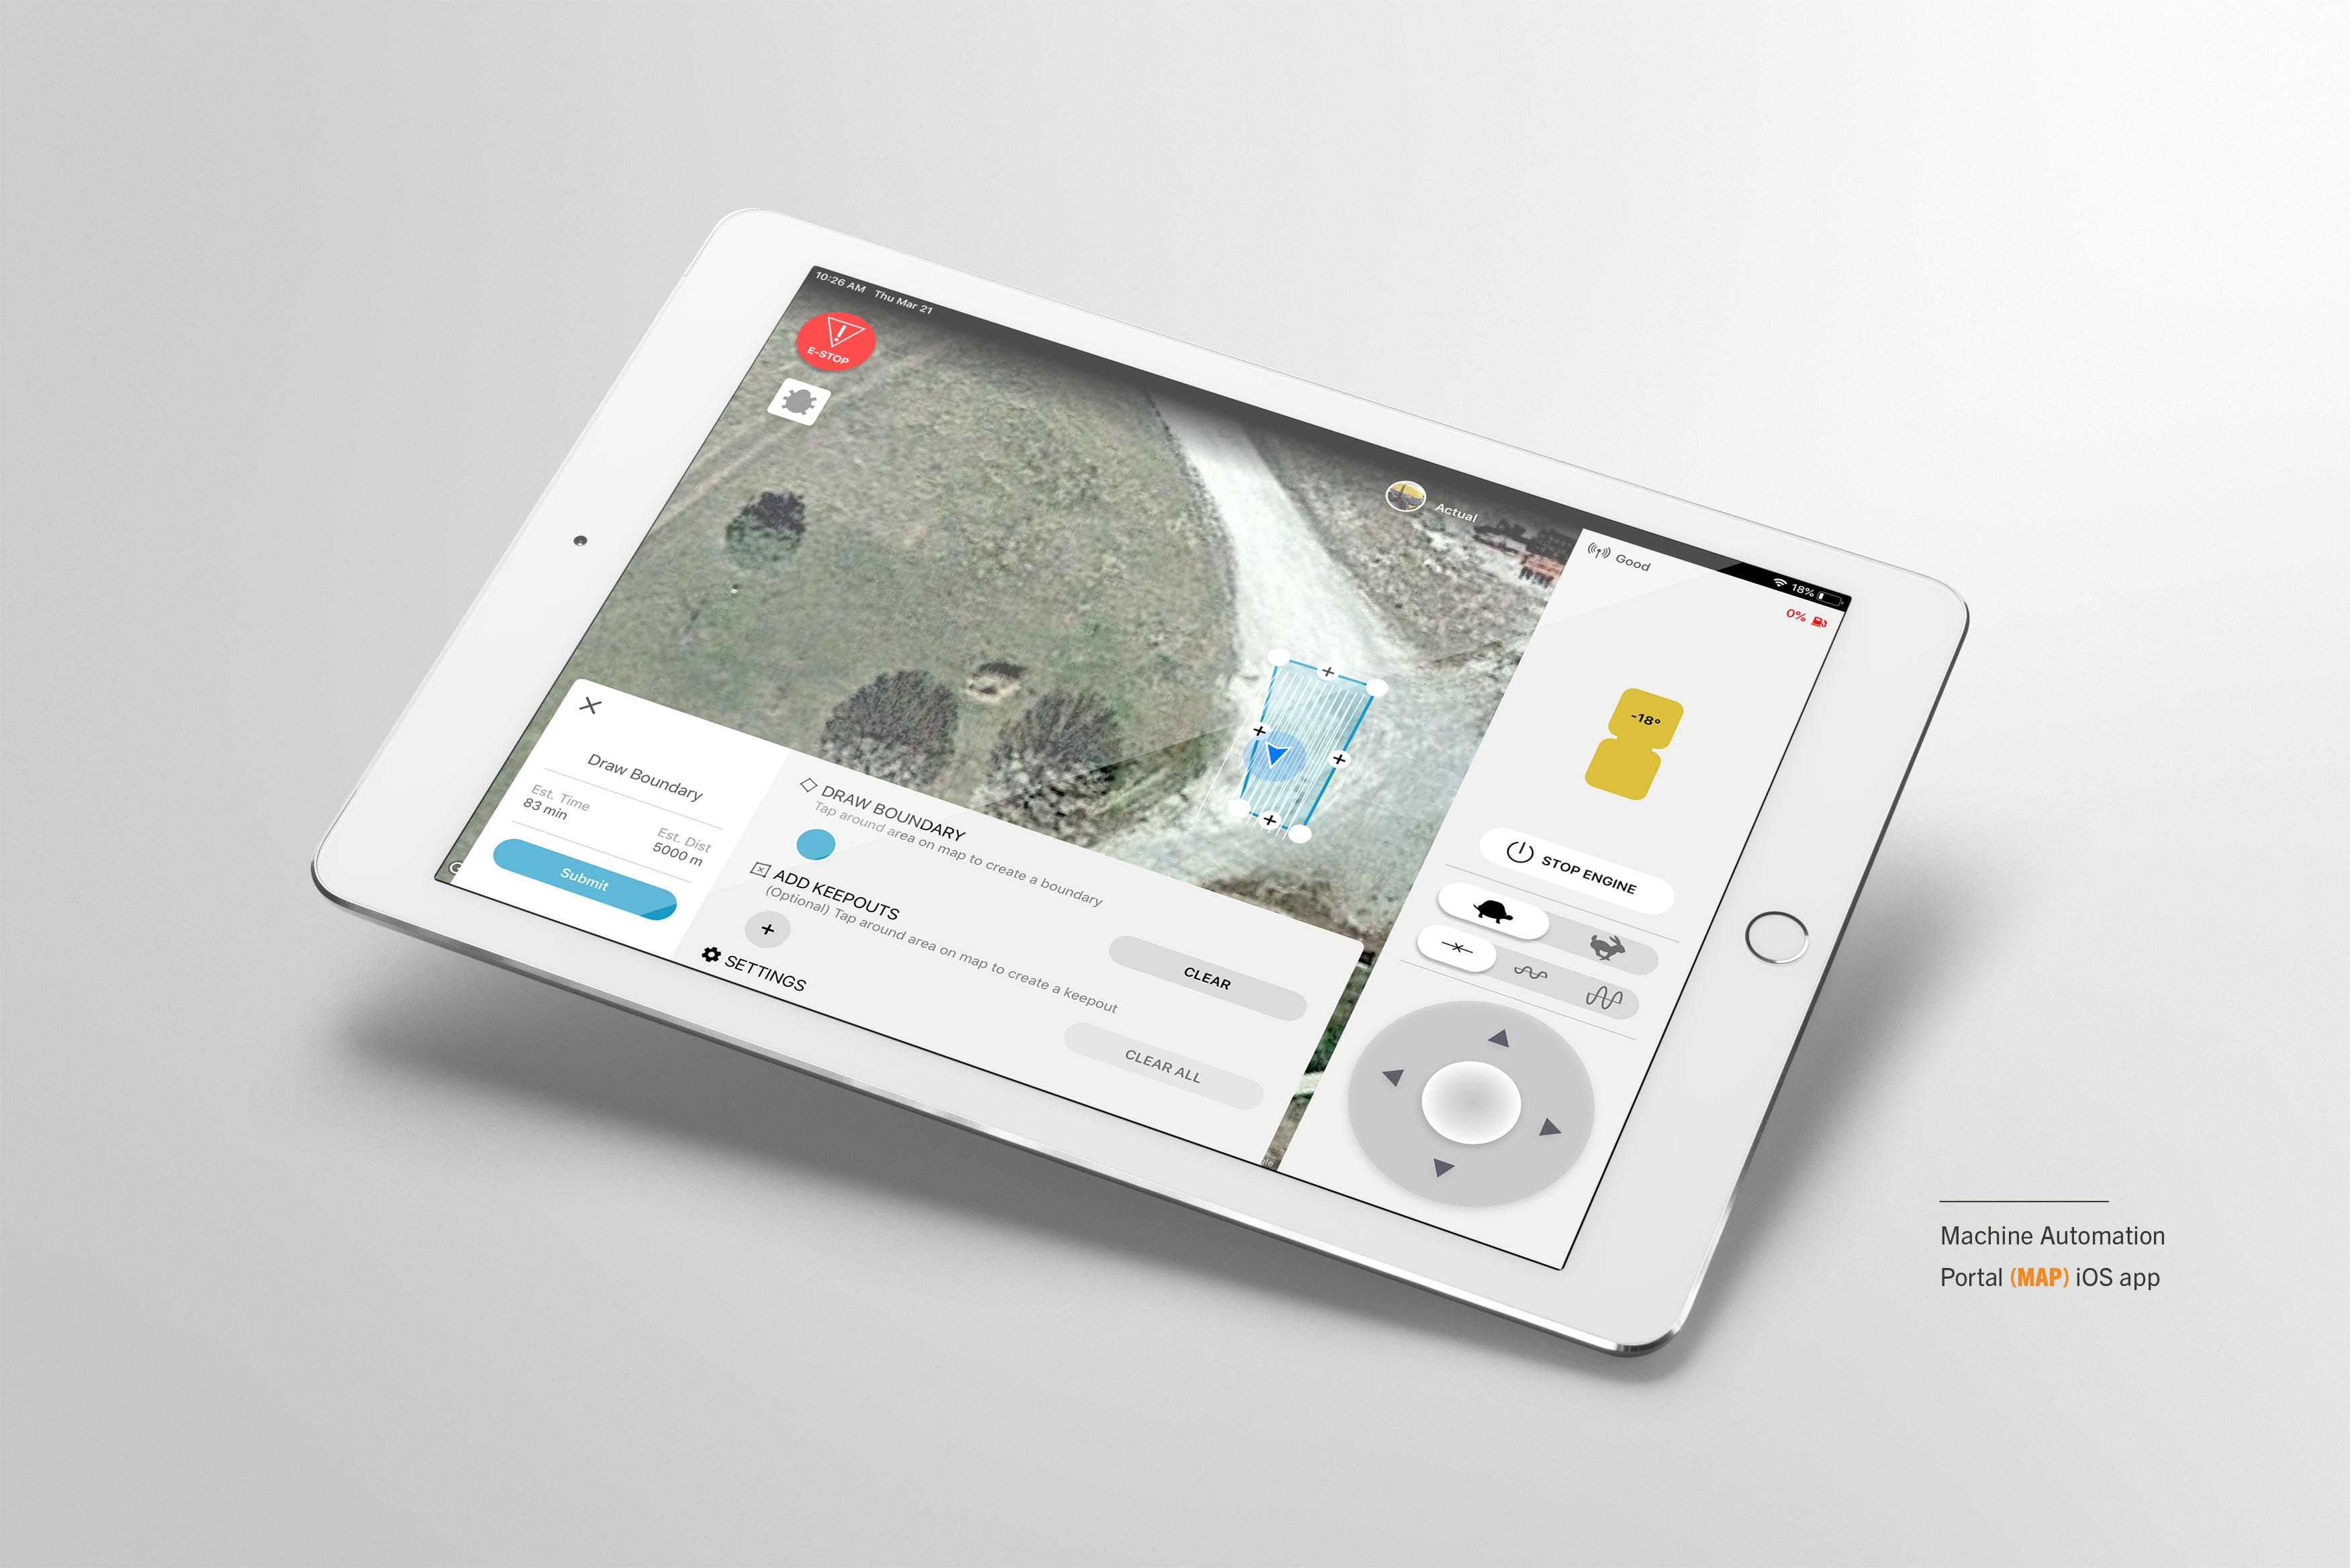 robotics dashboard on tablet